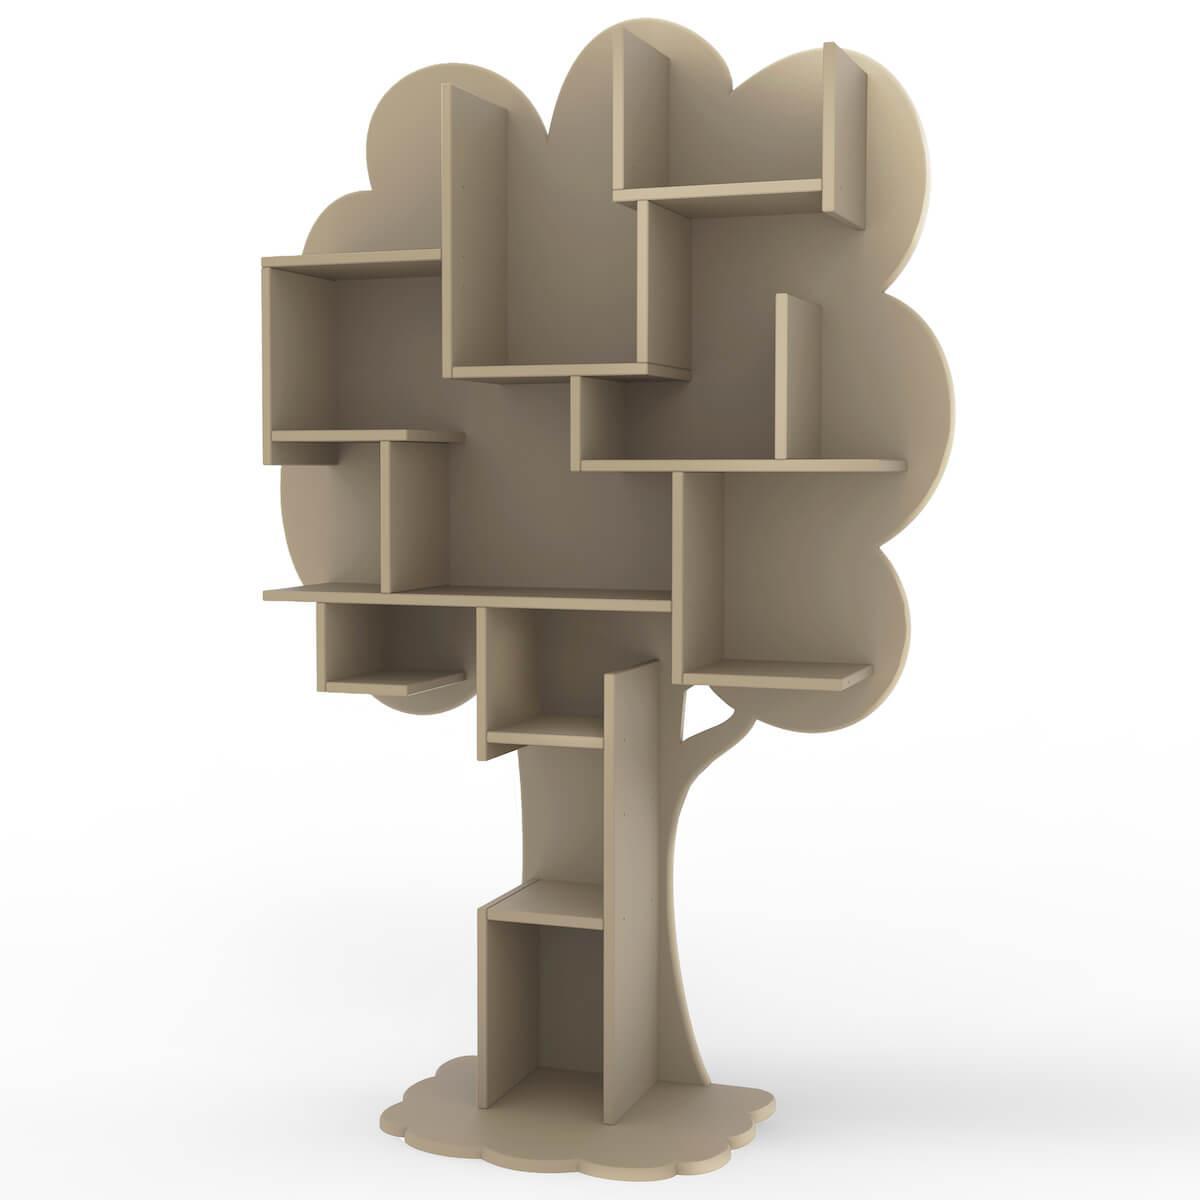 Bibliothèque arbre LOUANE Mathy by Bols taupe